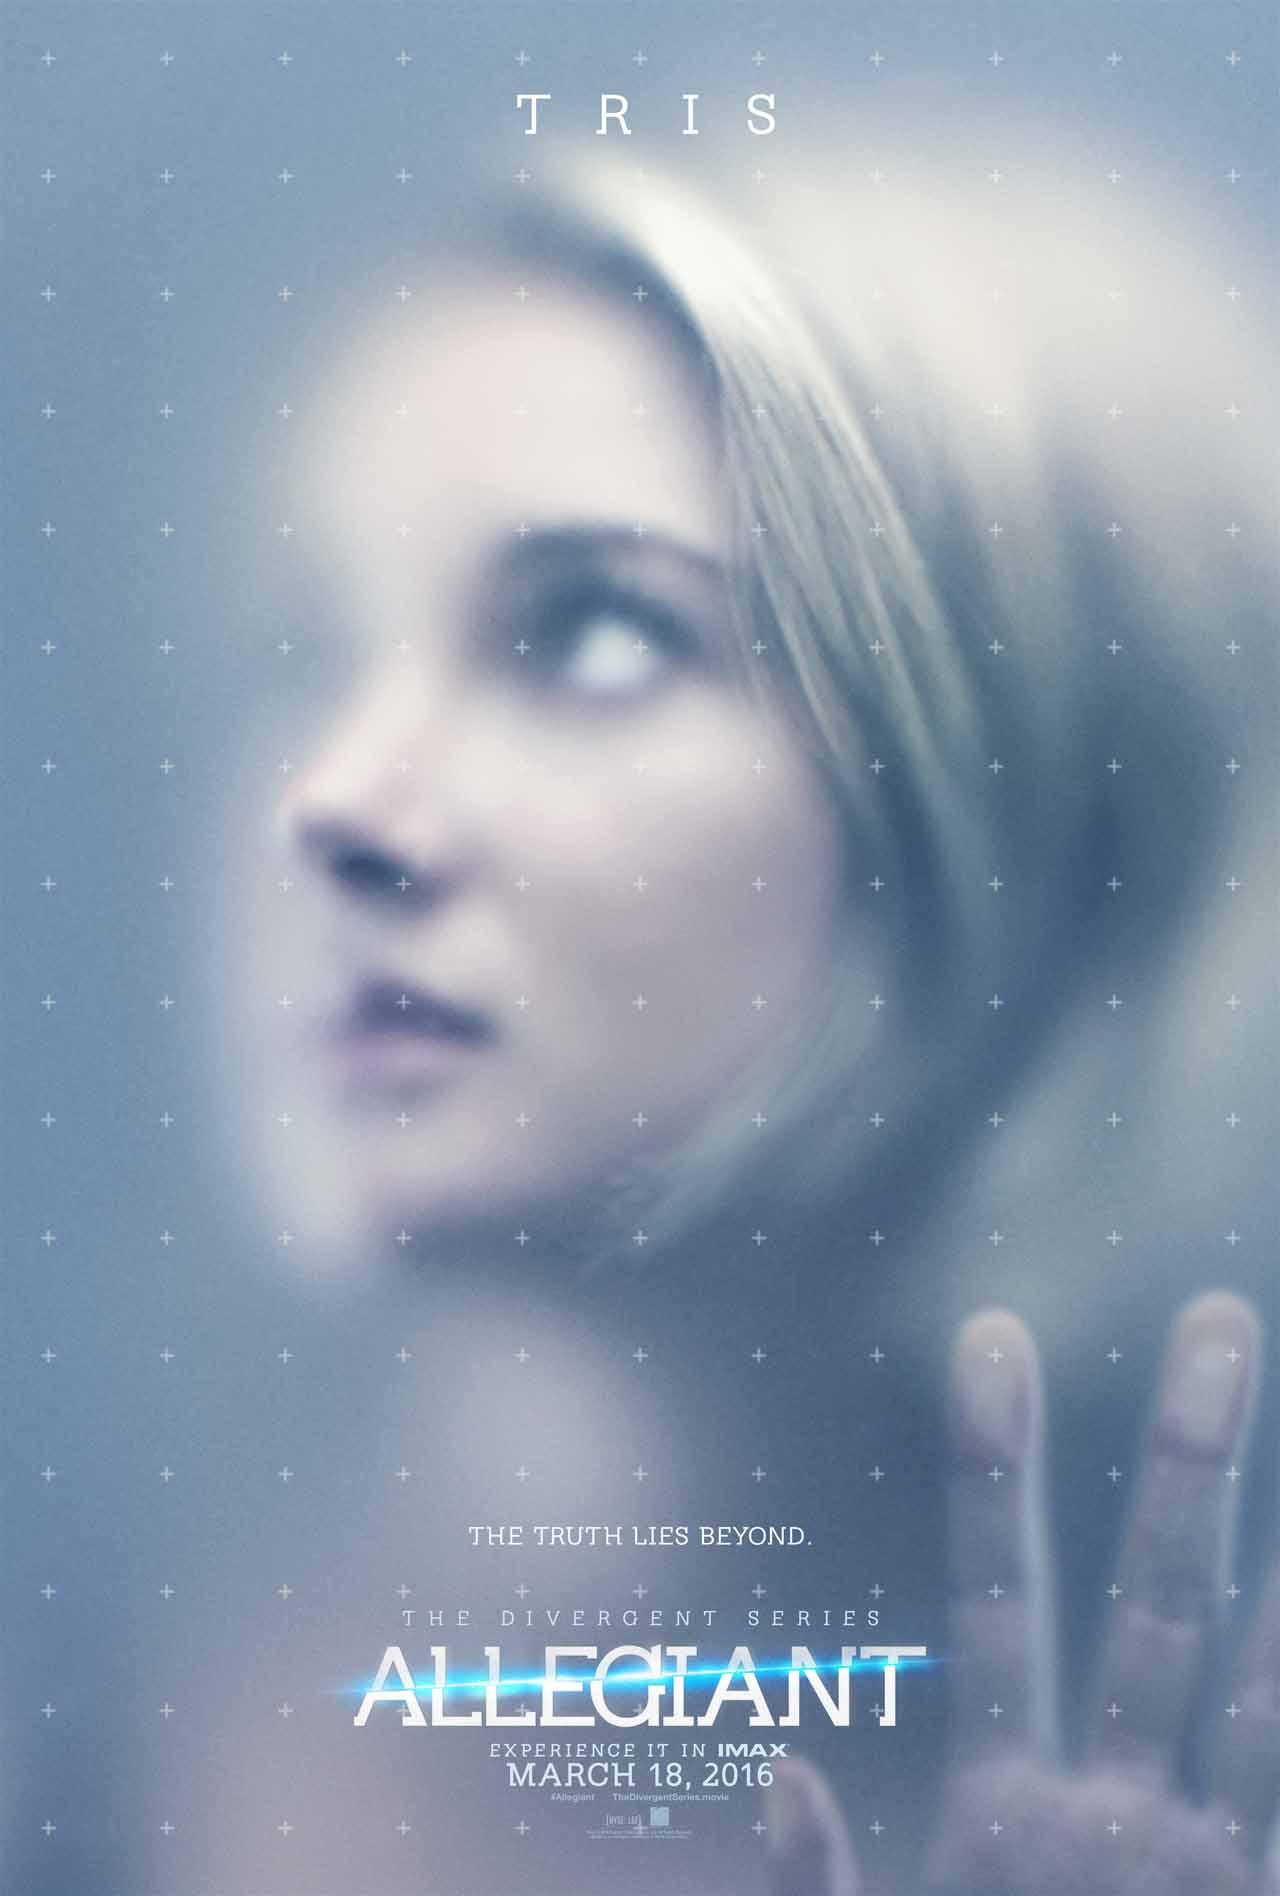 Allegiant: part 1 - Il poster dedicato a Tris